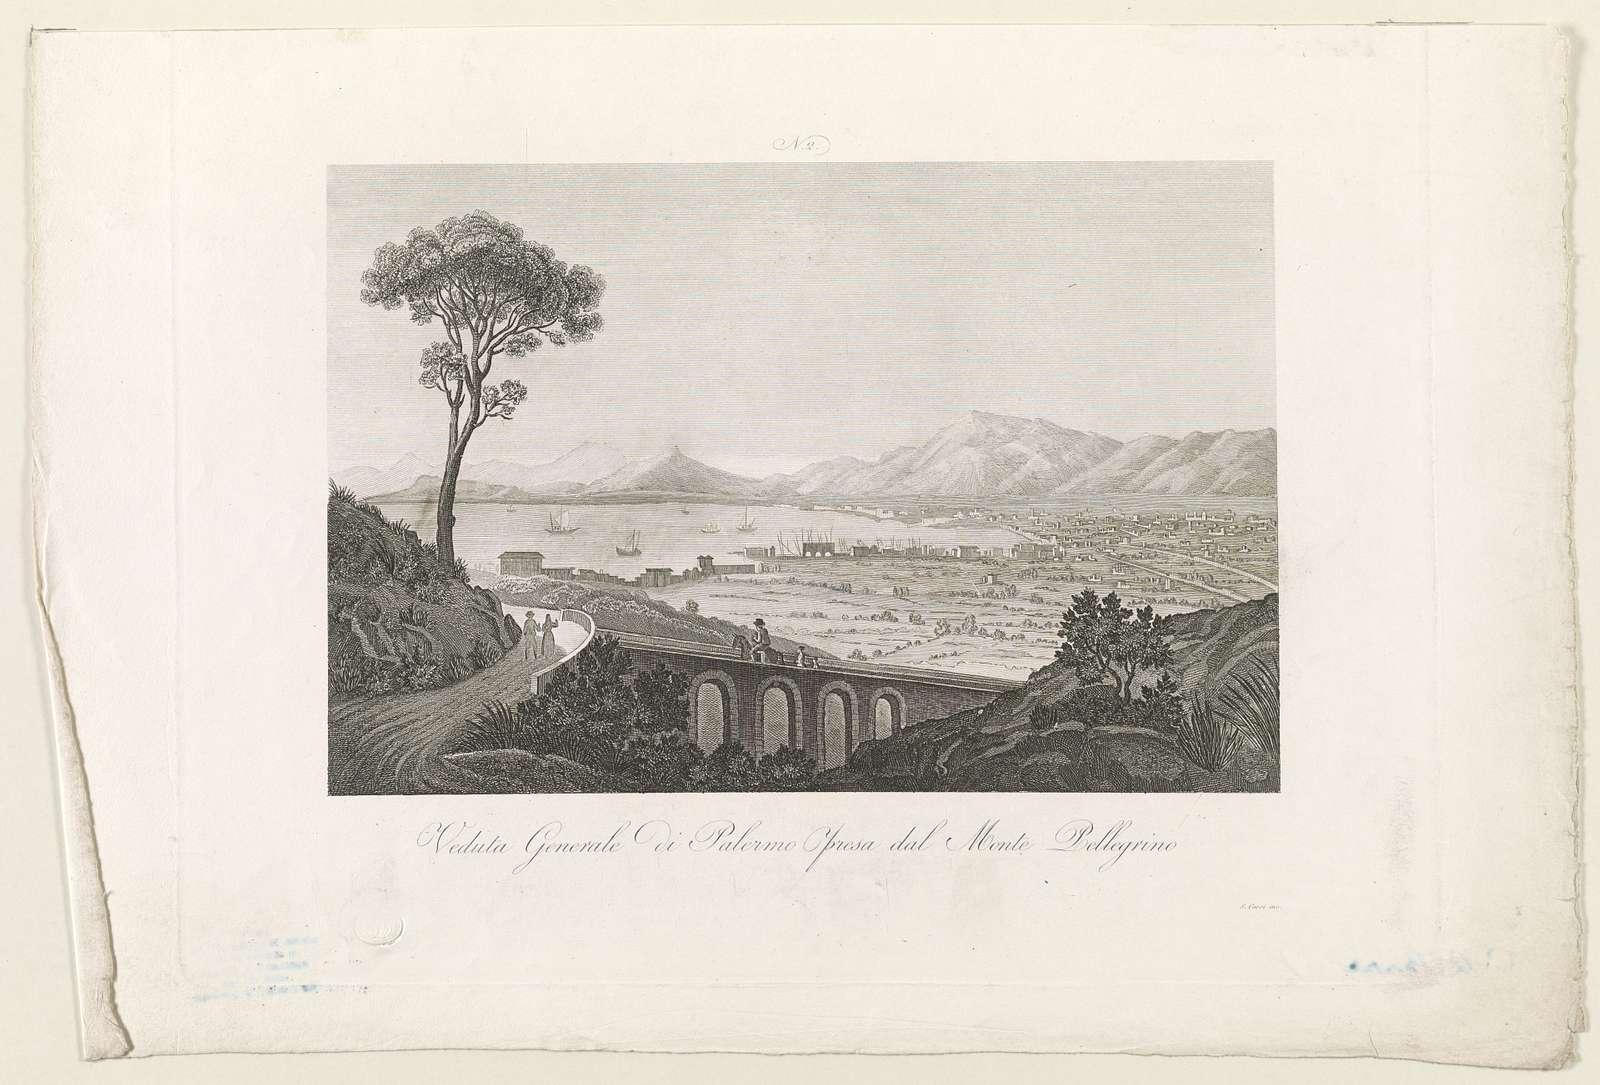 Veduta generale di palermo presa dal Monte Pellegrino